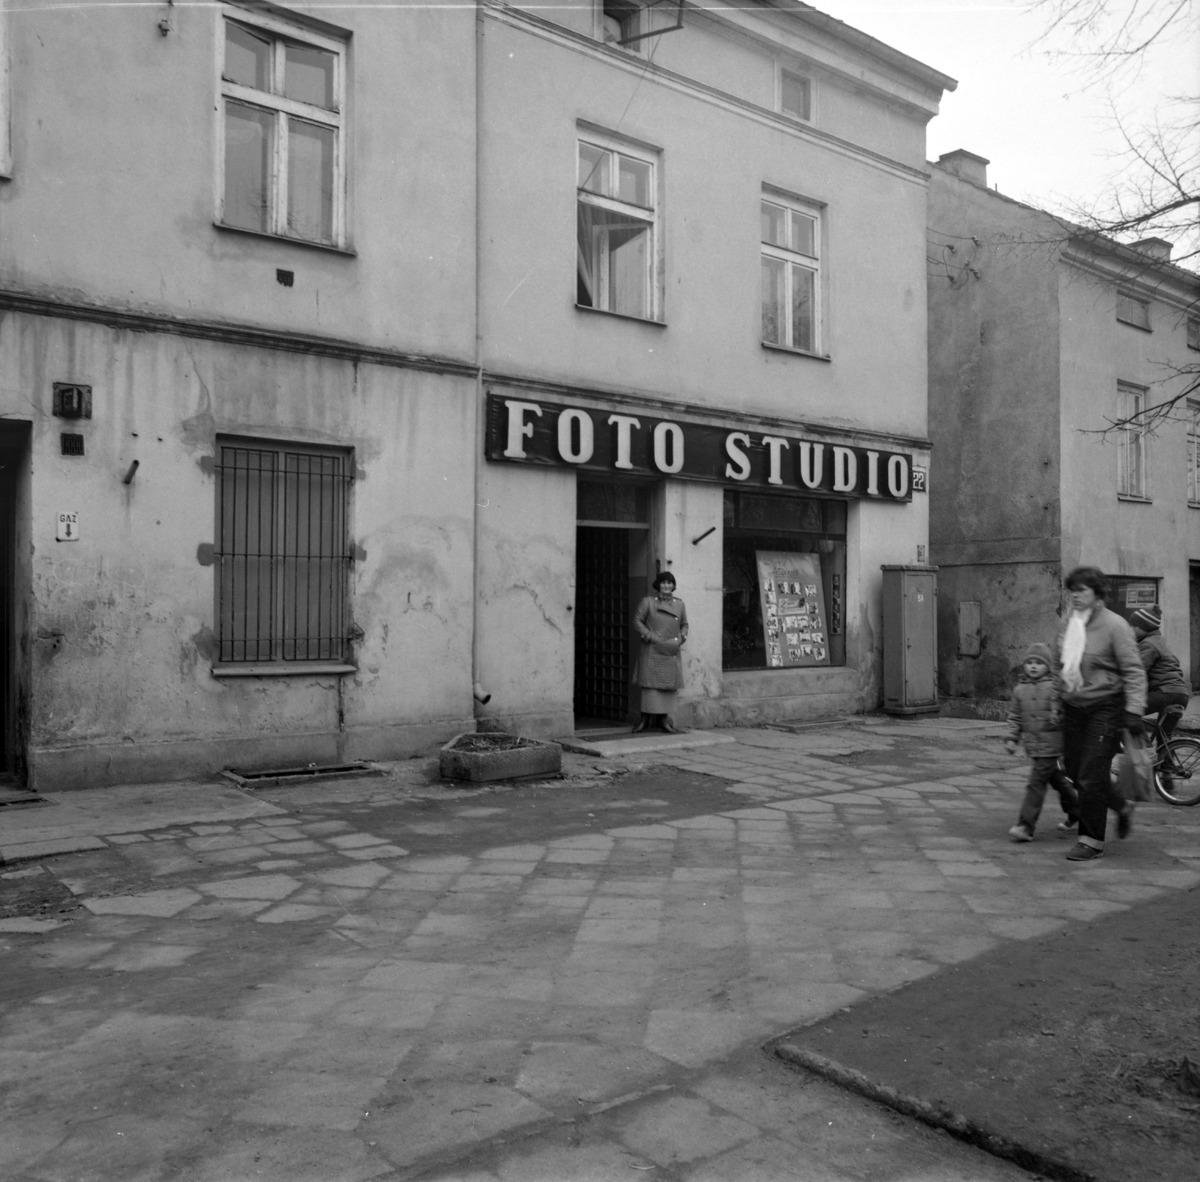 Foto Studio [4]